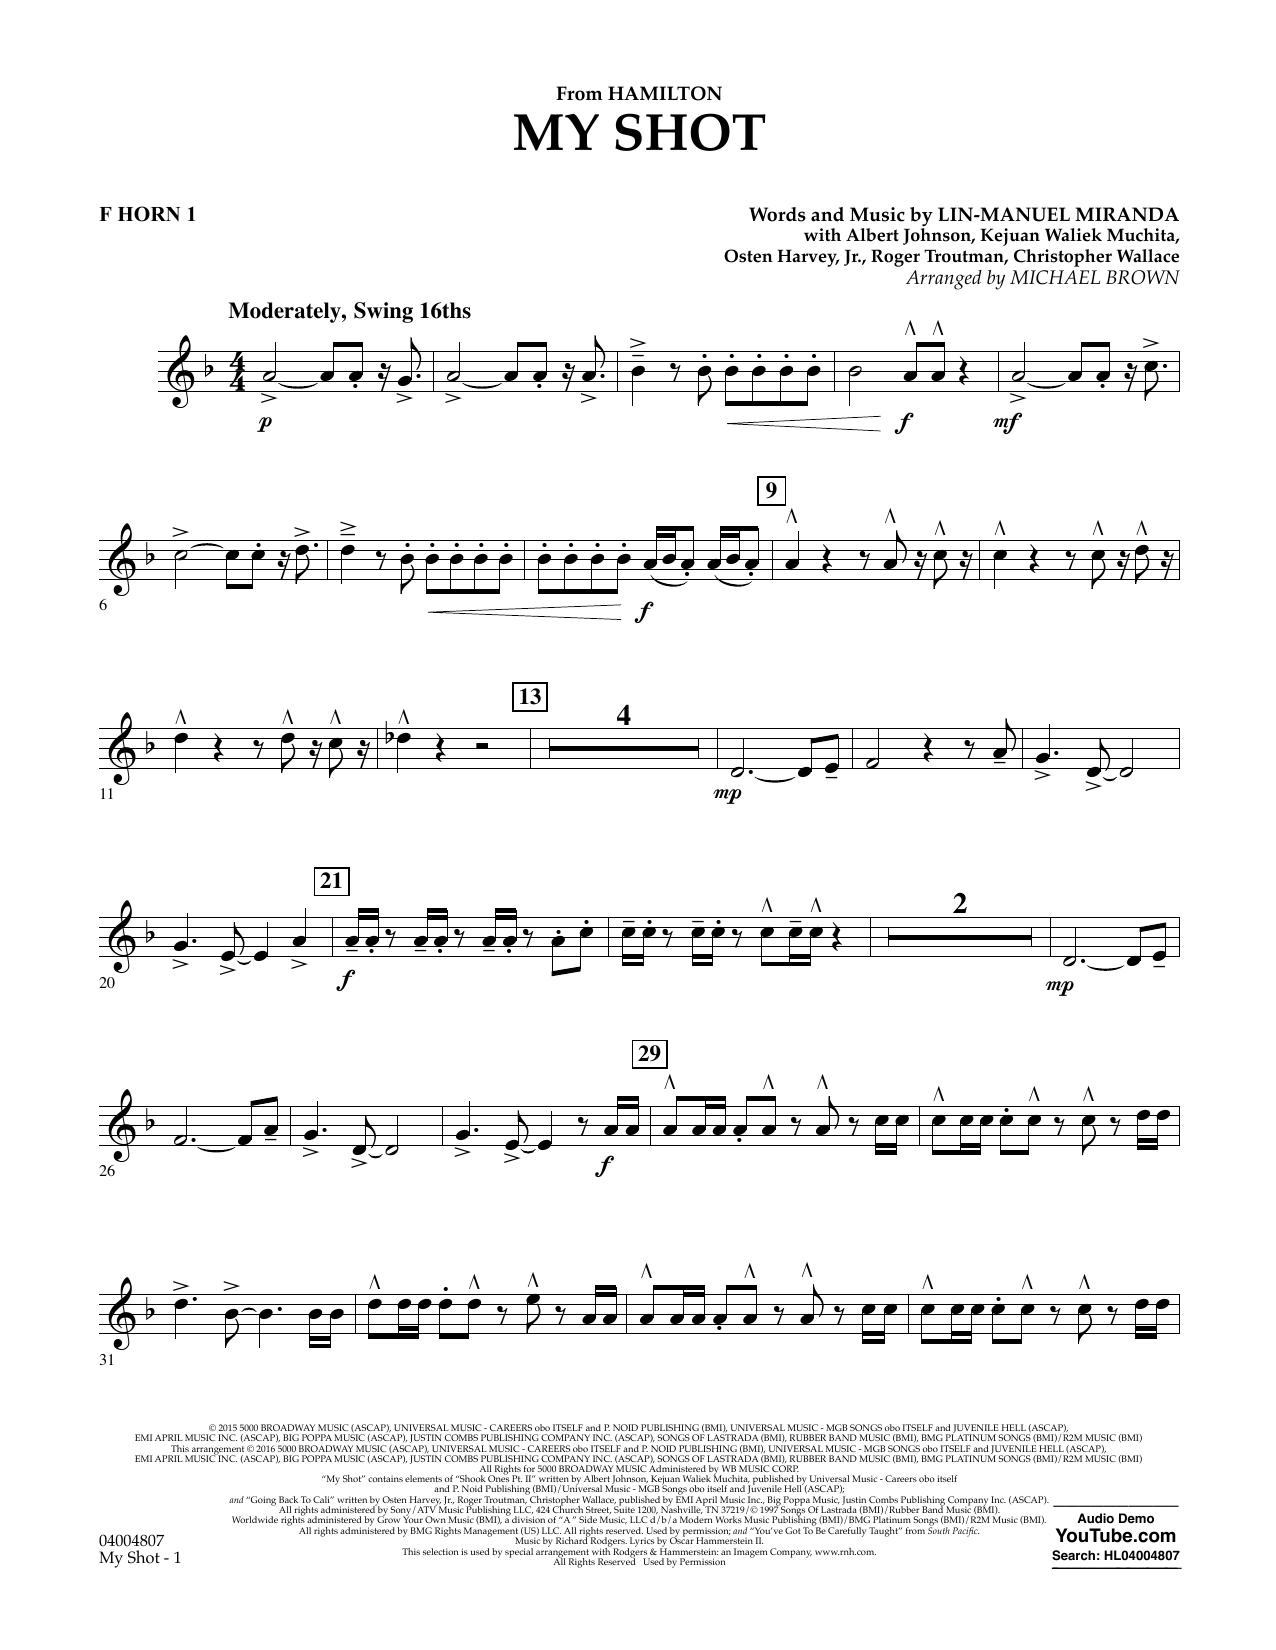 My Shot (from Hamilton) - F Horn 1 Sheet Music